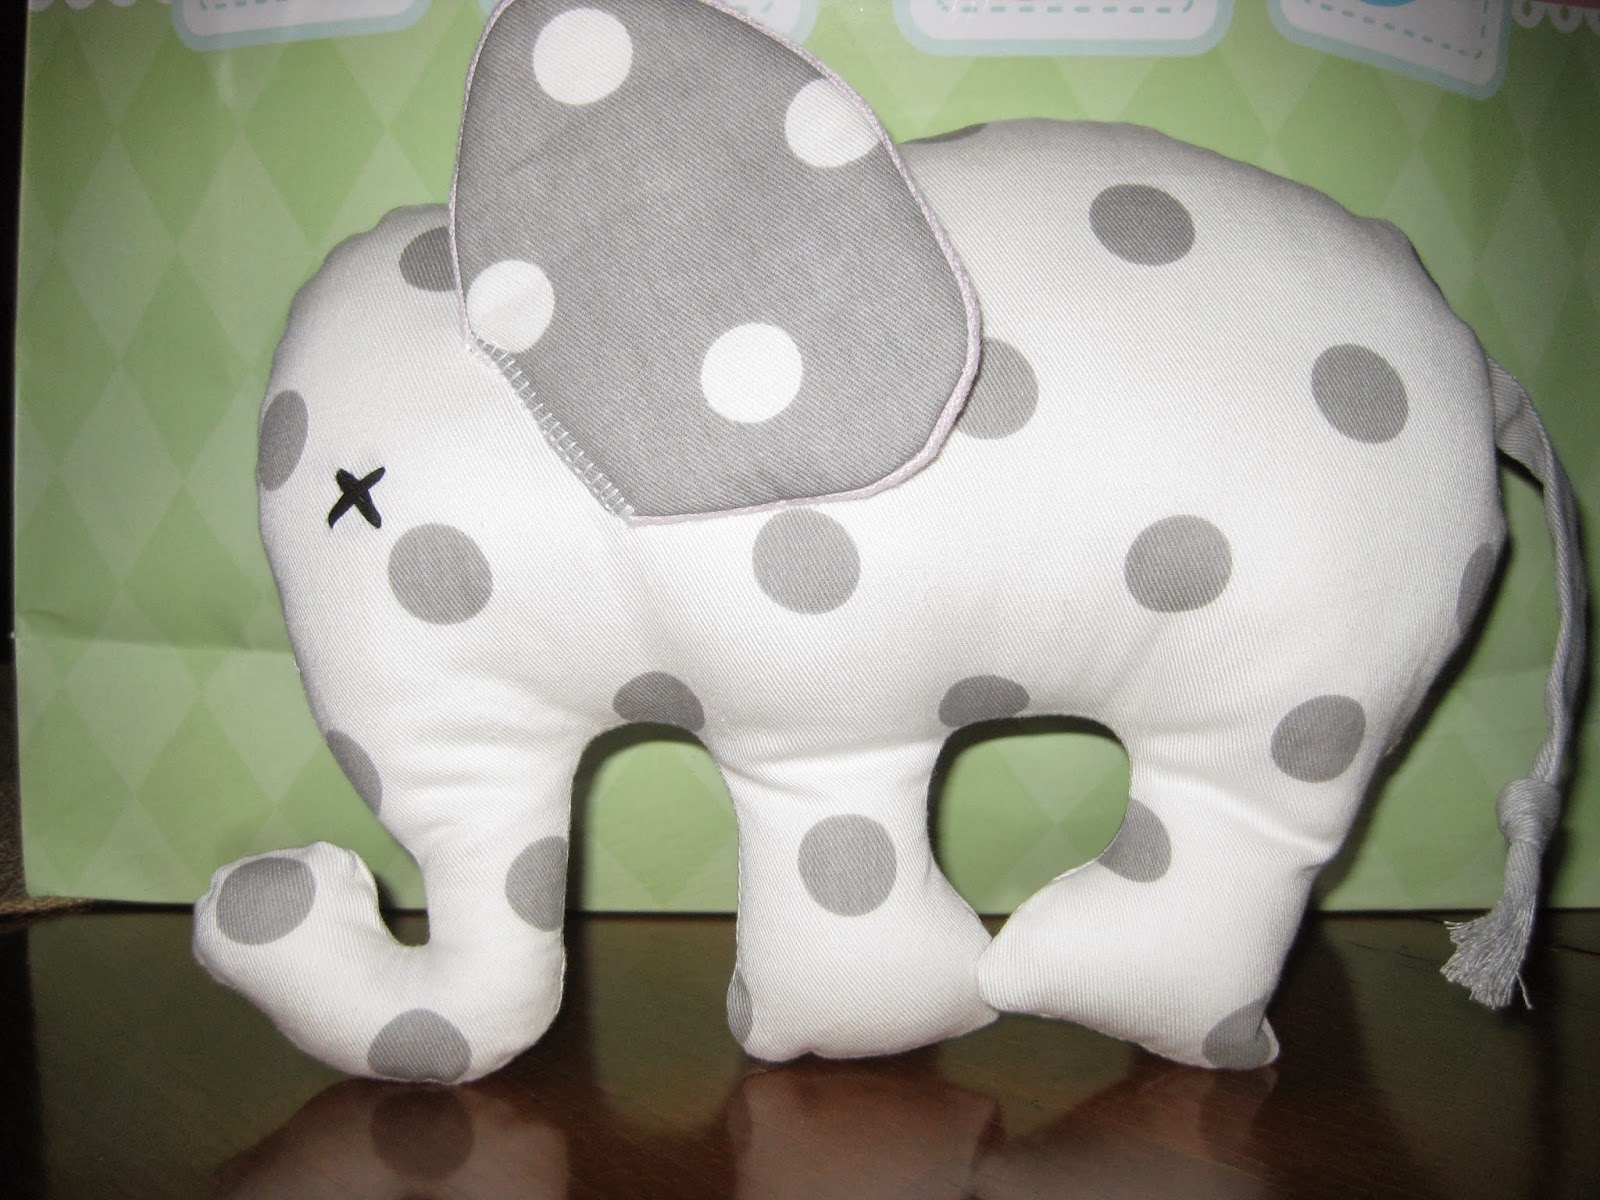 Cloudy creations nursery sewing jeuxipadfo Gallery